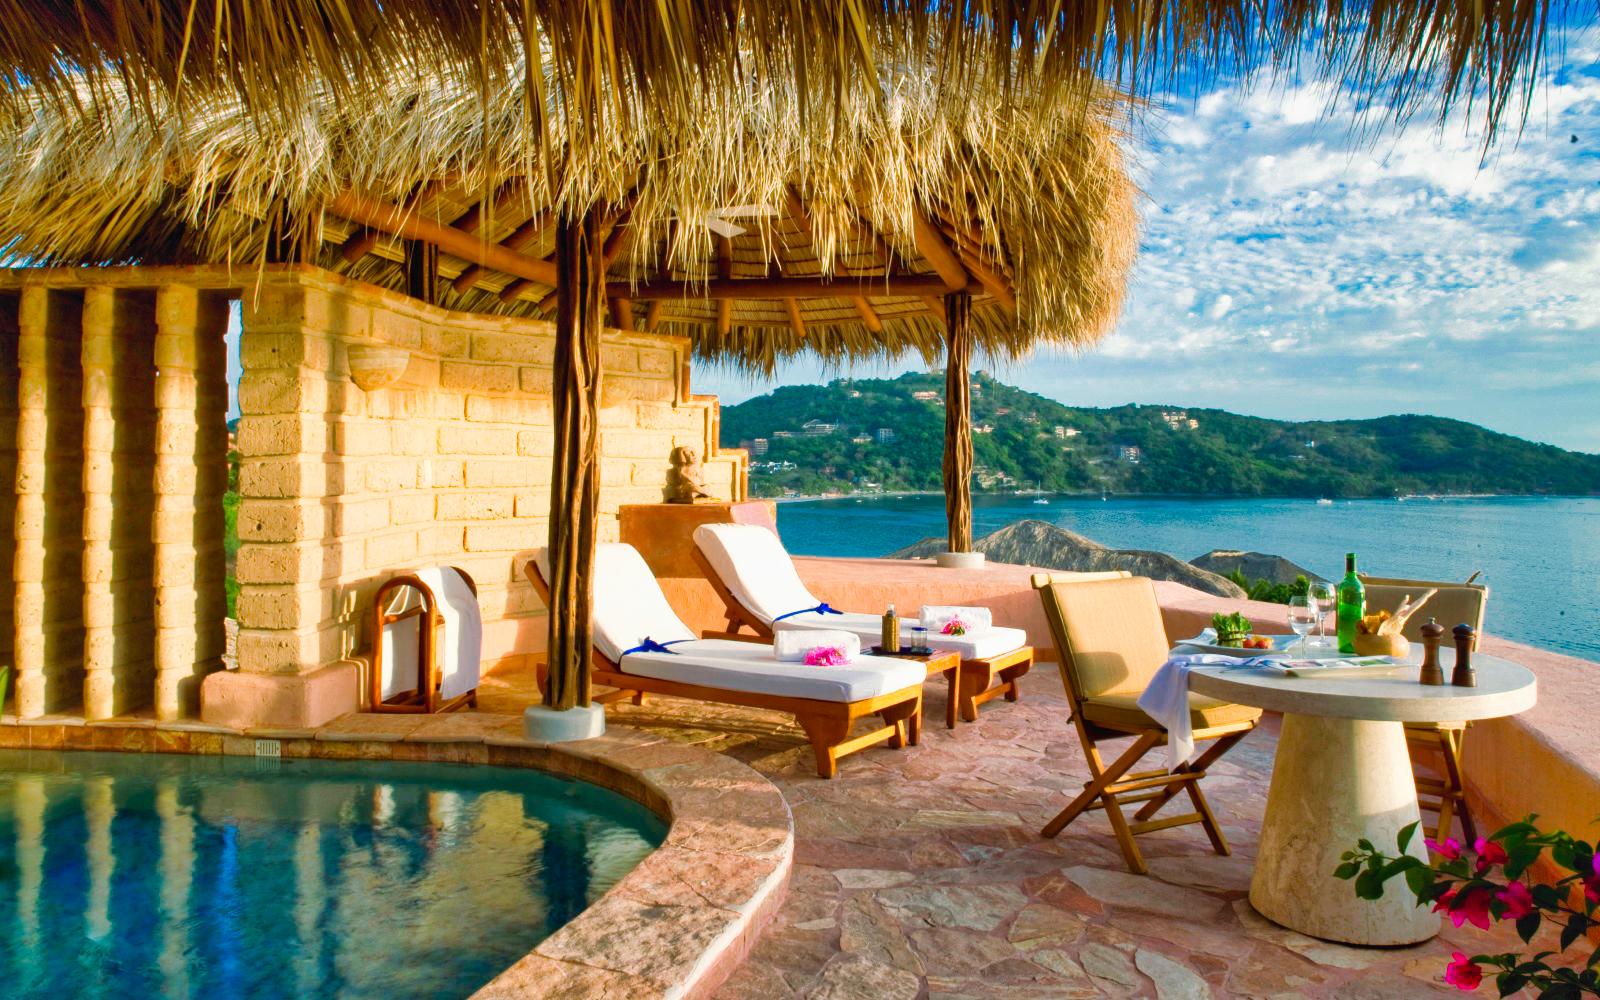 201402-w-best-mexico-beach-resorts-la-casa-que-canta_0